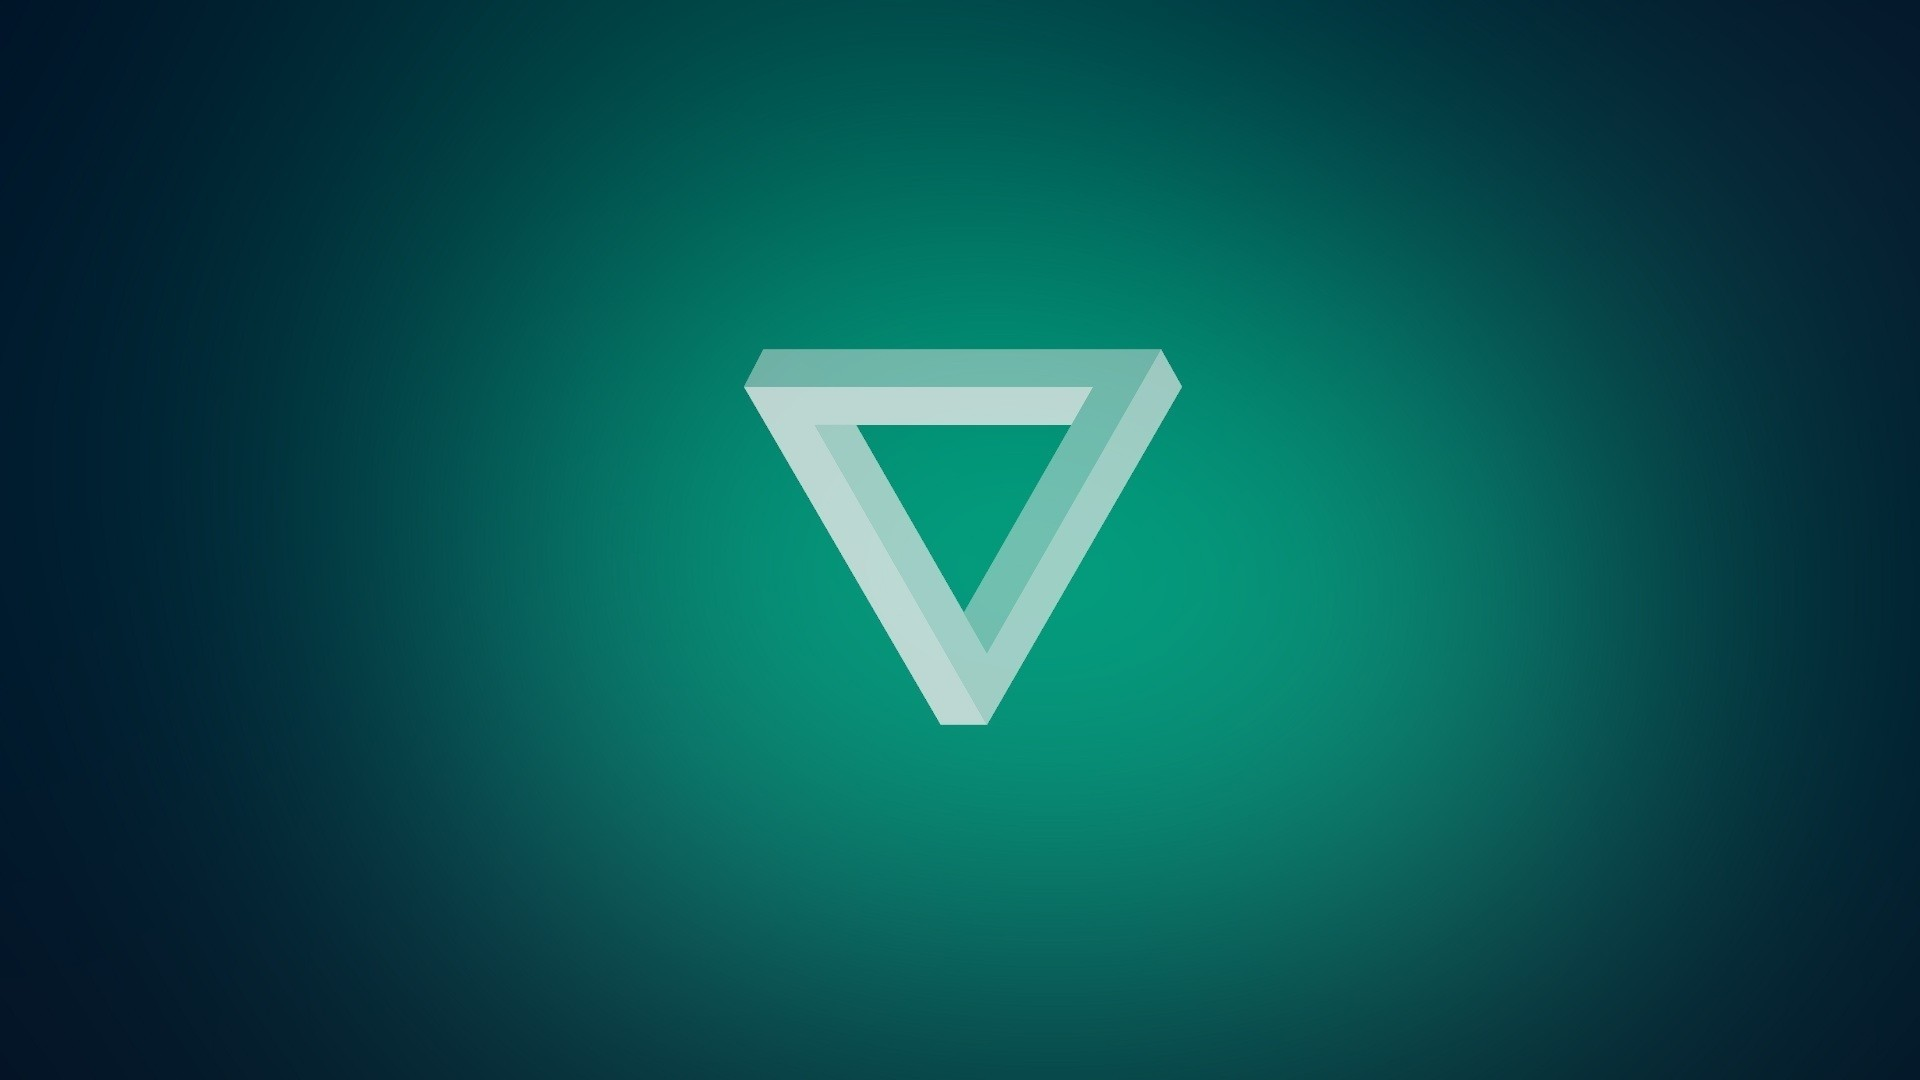 Preview wallpaper triangle, light, dark, shape 1920×1080